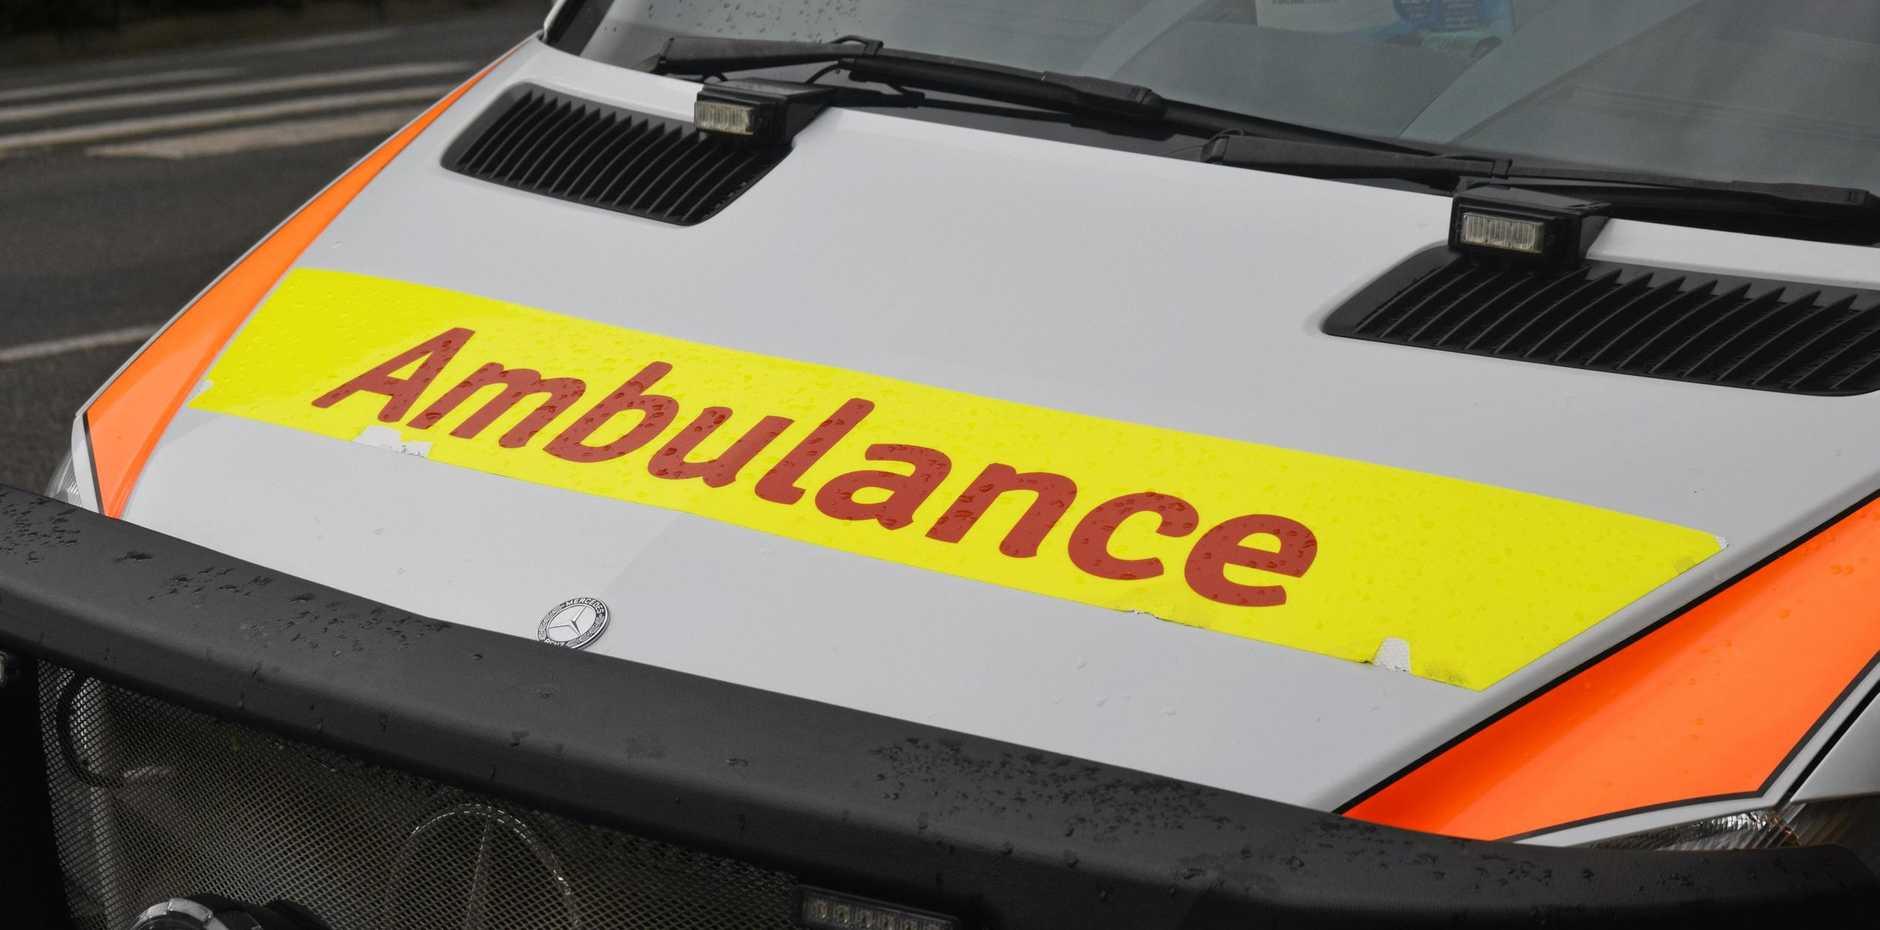 Paramedics attended a traffic crash near Dysart involving a man in his 30s.